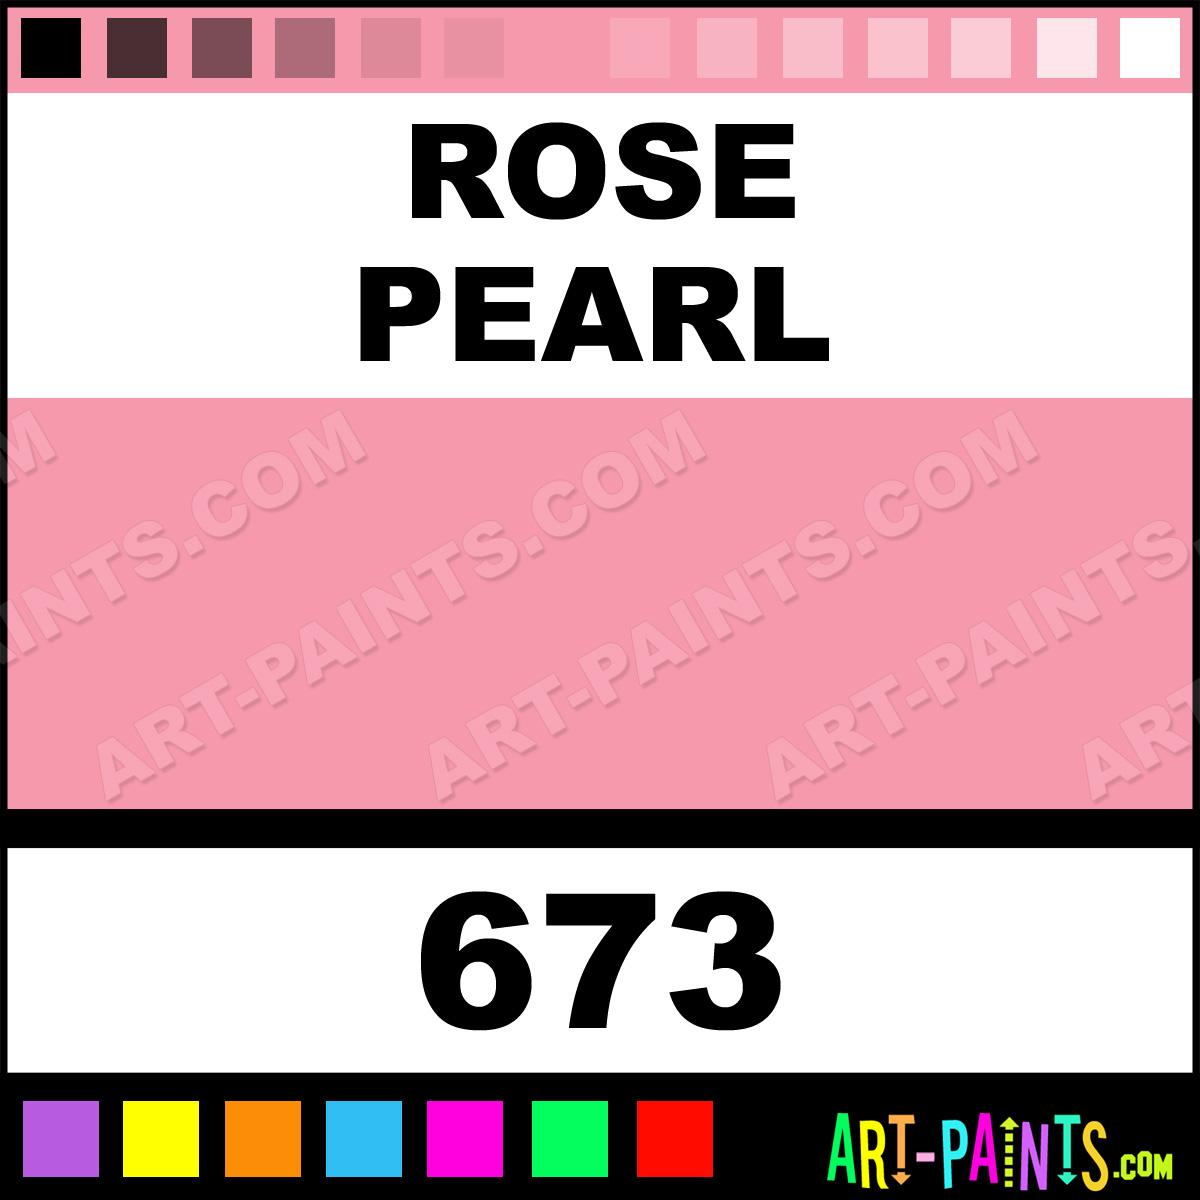 Folk art color chart acrylic paint - Rose Pearl Paint 673 By Folk Art Metallics Paints